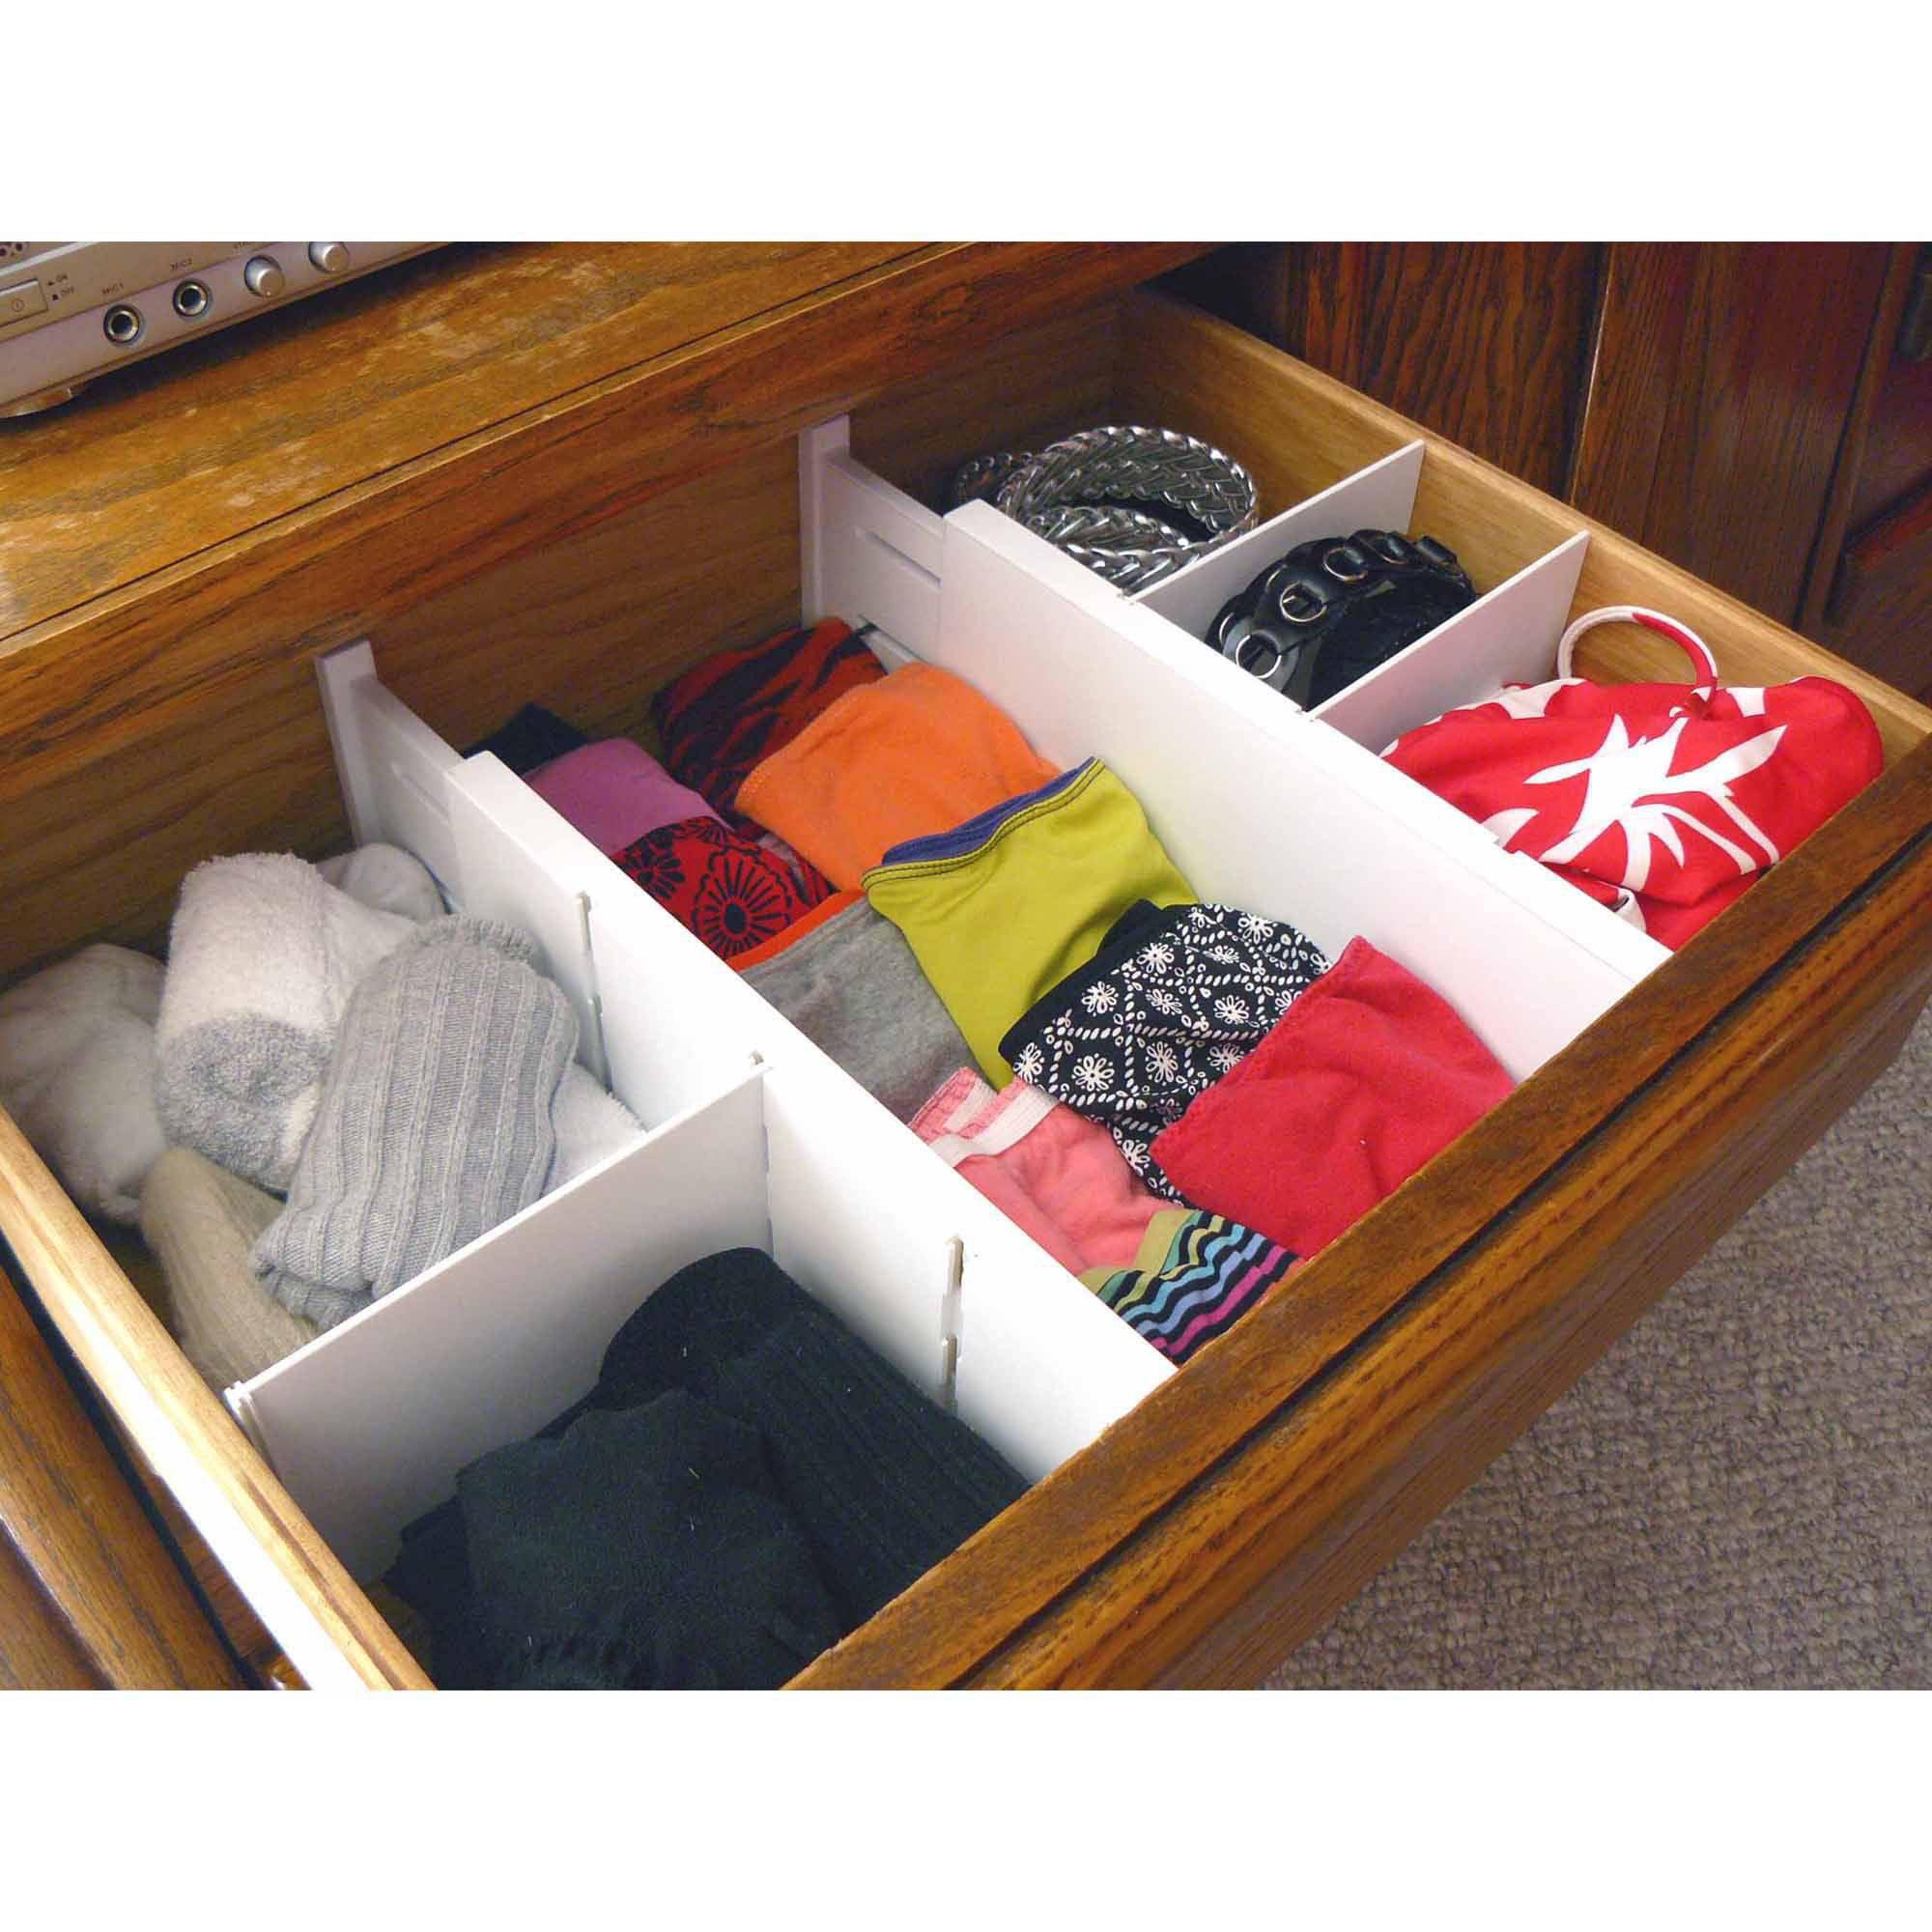 bathroom ideas and poliform bedroom organizers dividers dresser drawer fascinating organizer